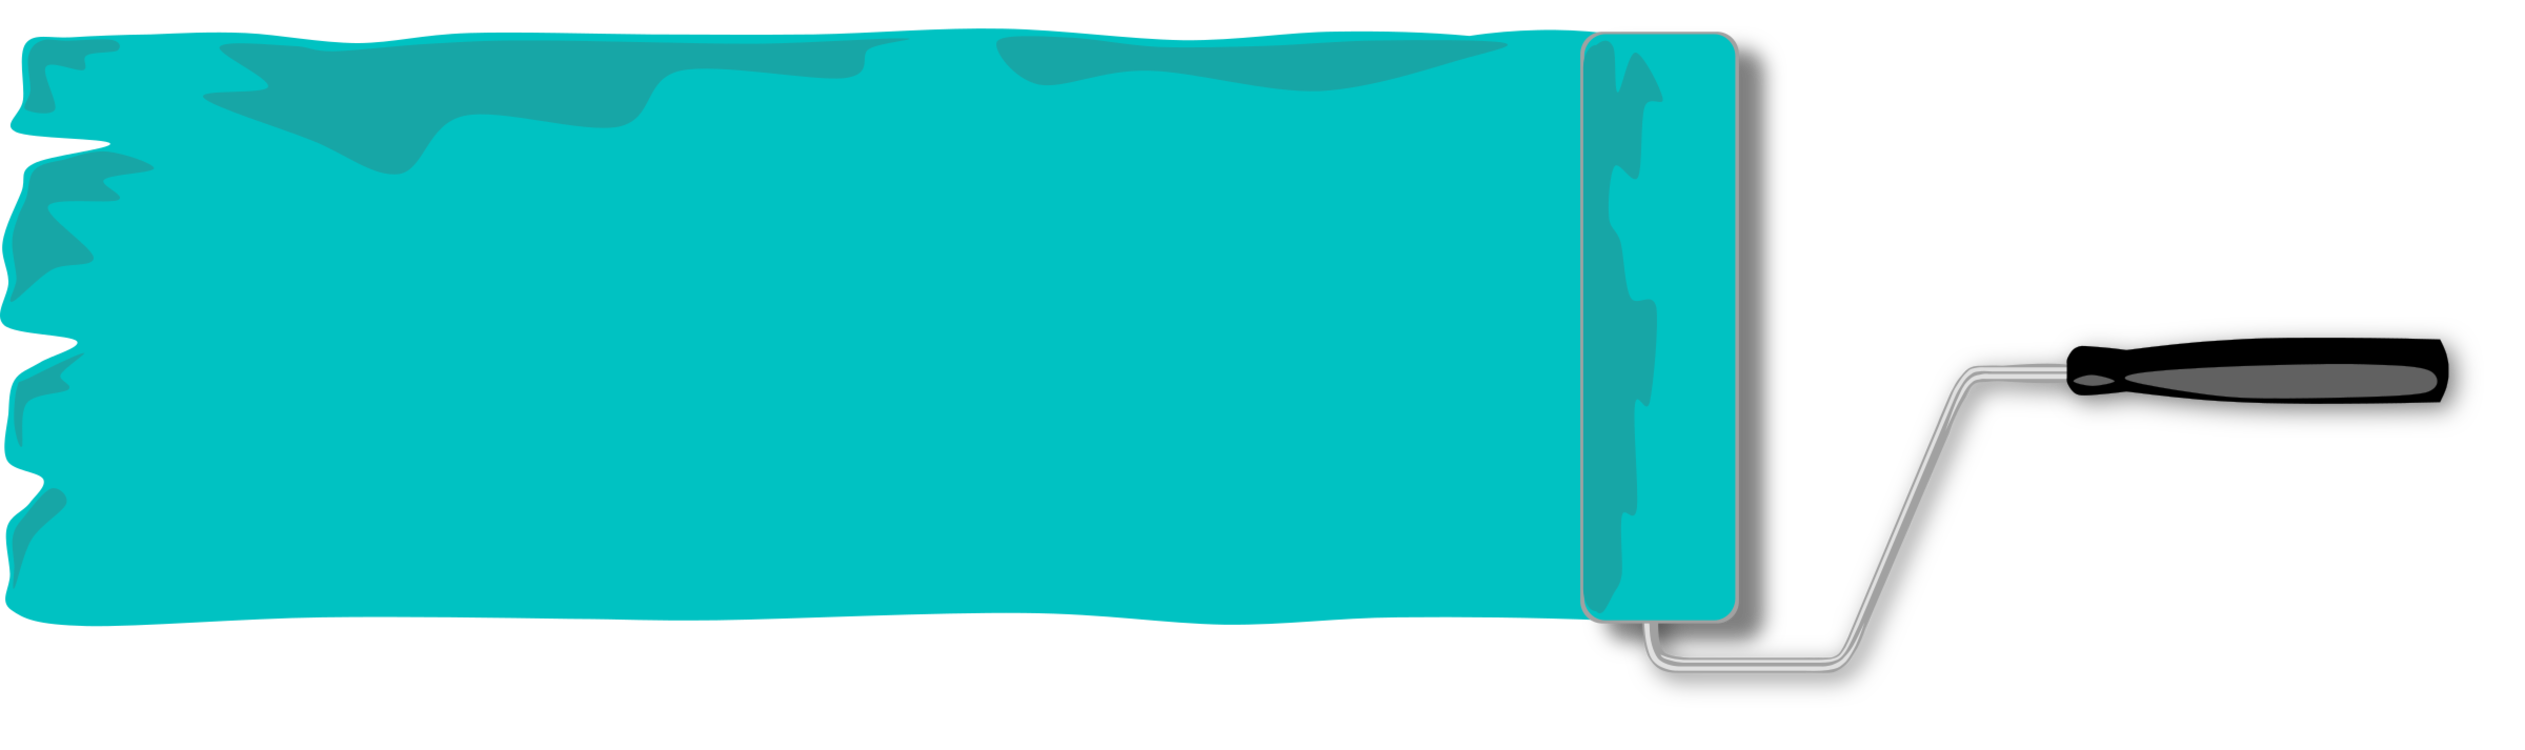 Blue,Turquoise,Aqua